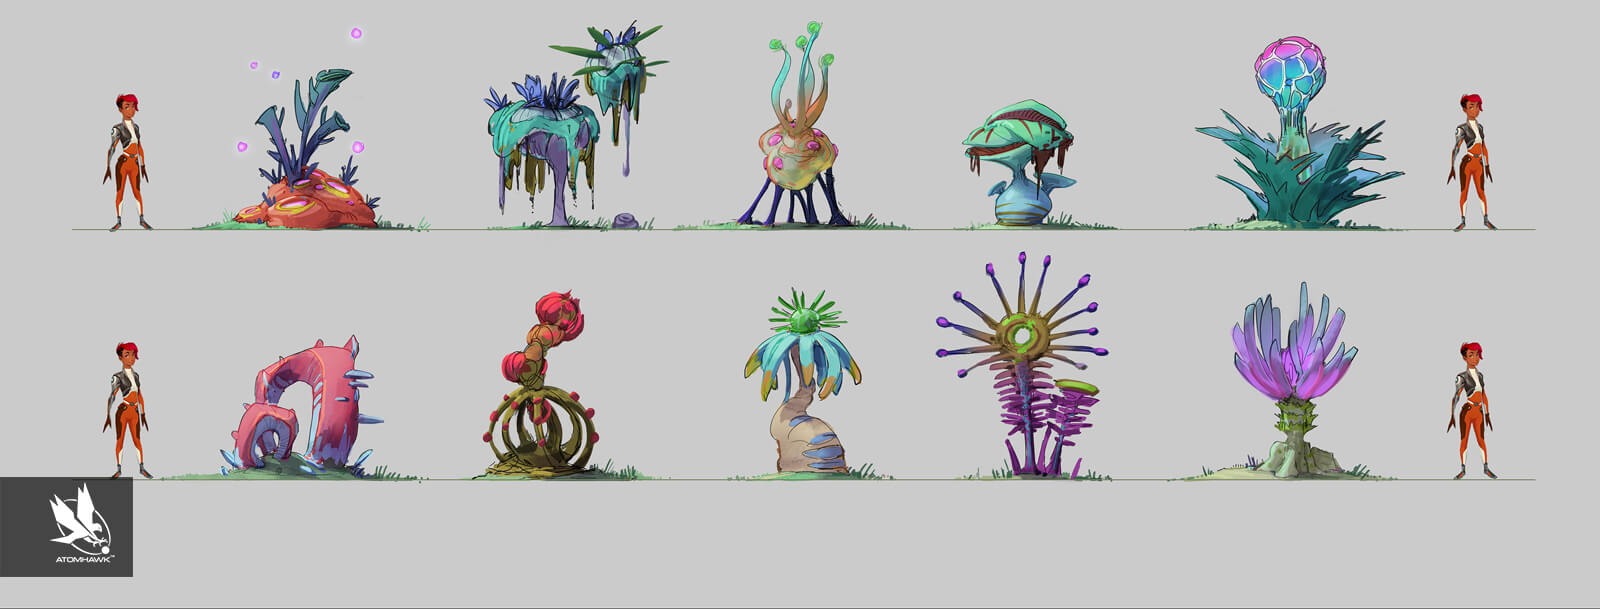 Atomhawk_Unity_3D-Game-Kit_Concept-Art_Breakout-Design_Alien-Vegetation-Bushes2.jpg